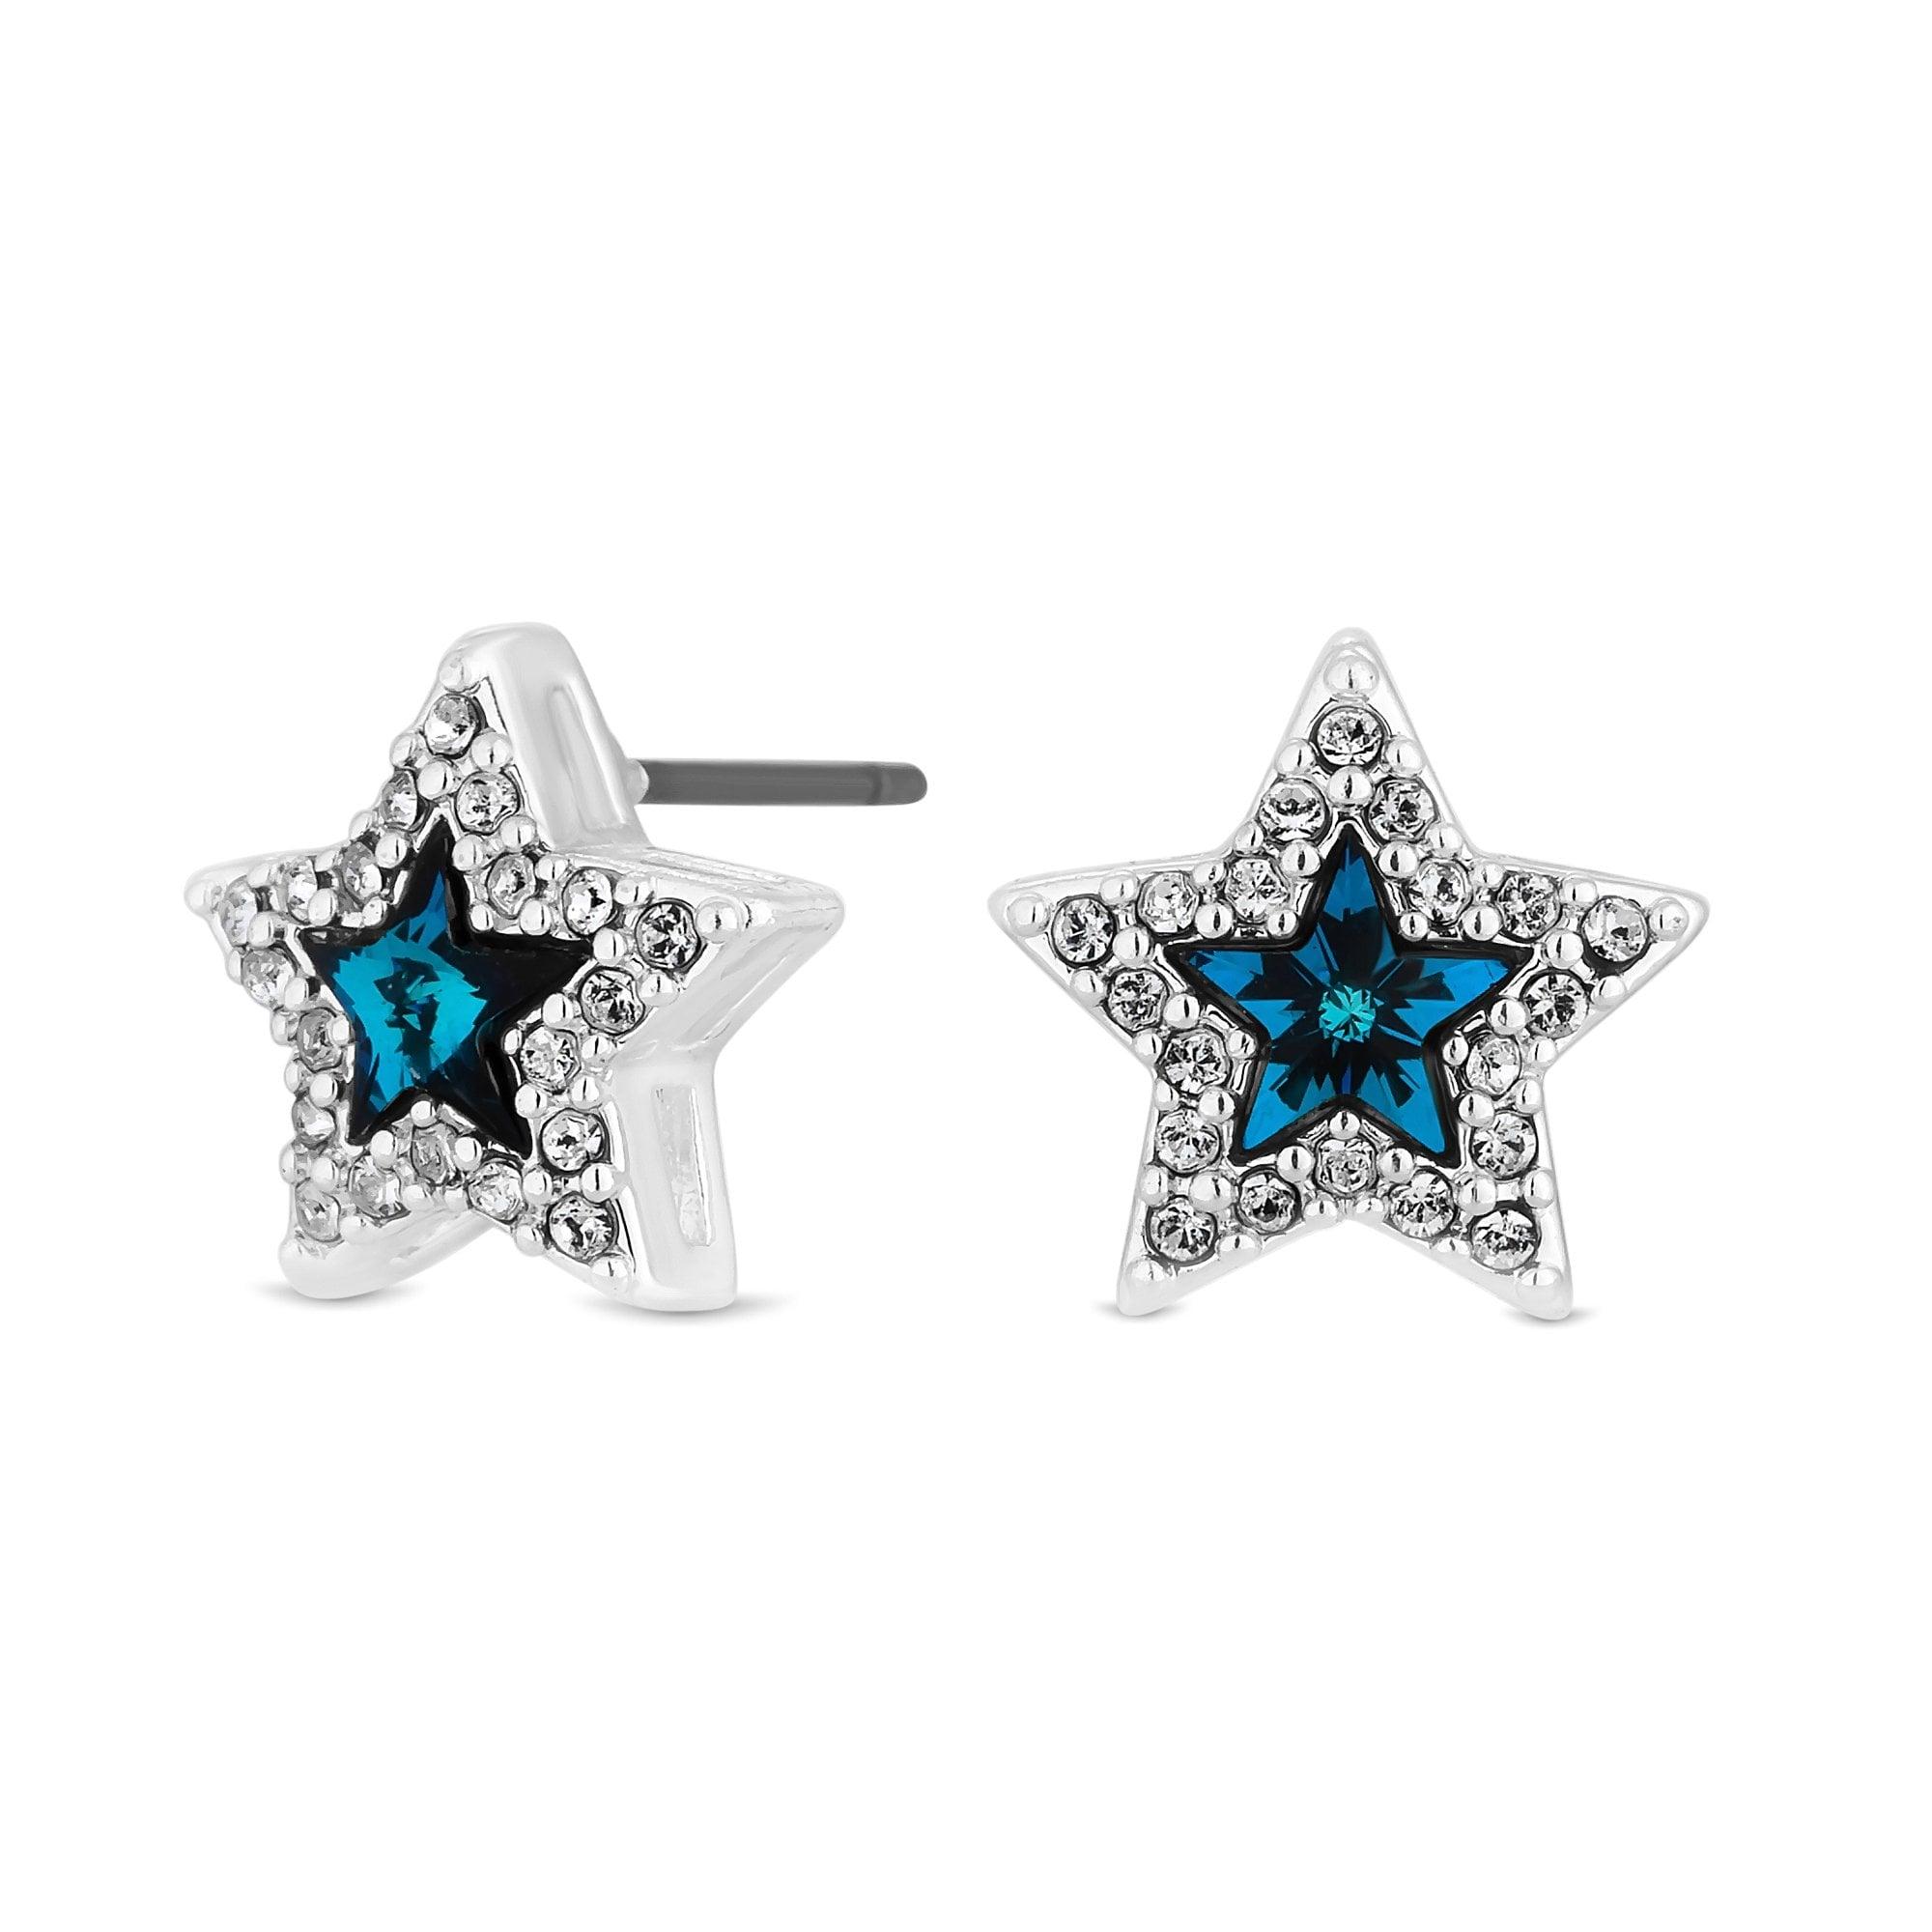 Bermuda Blue Star Stud Earrings Made With Swarovski Crystals